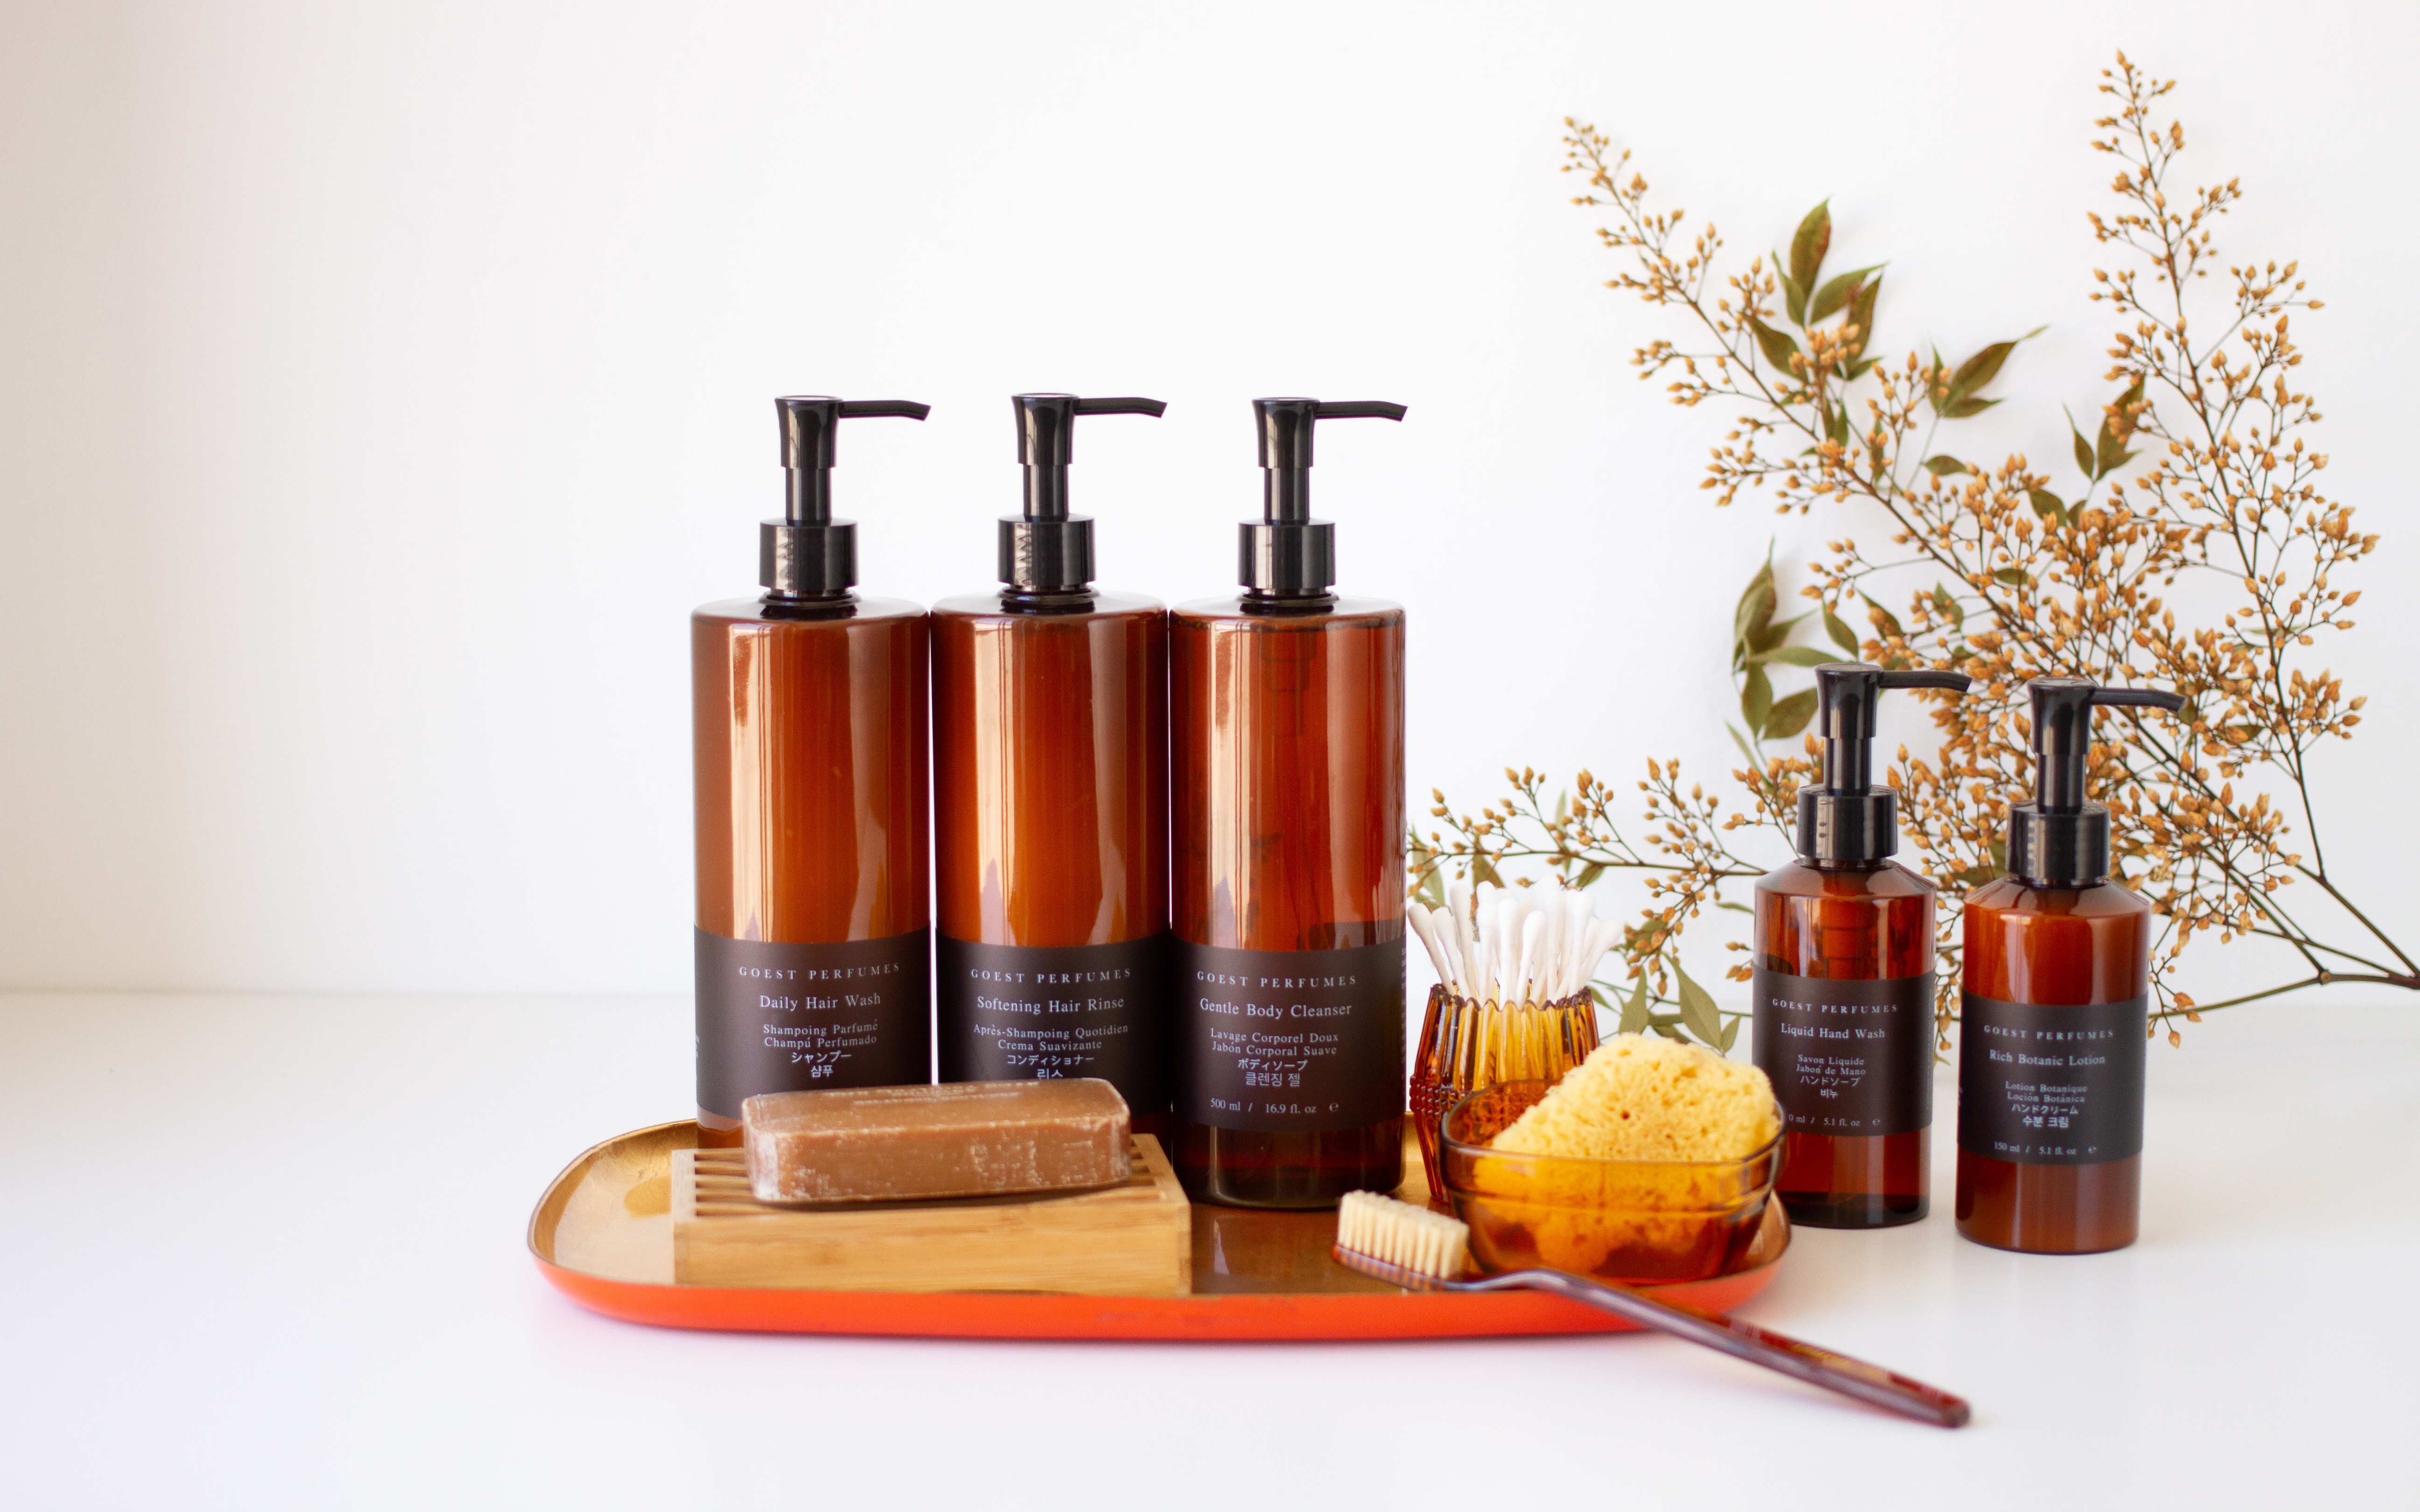 Goest Perfumes Goest Hotel soap.jpg